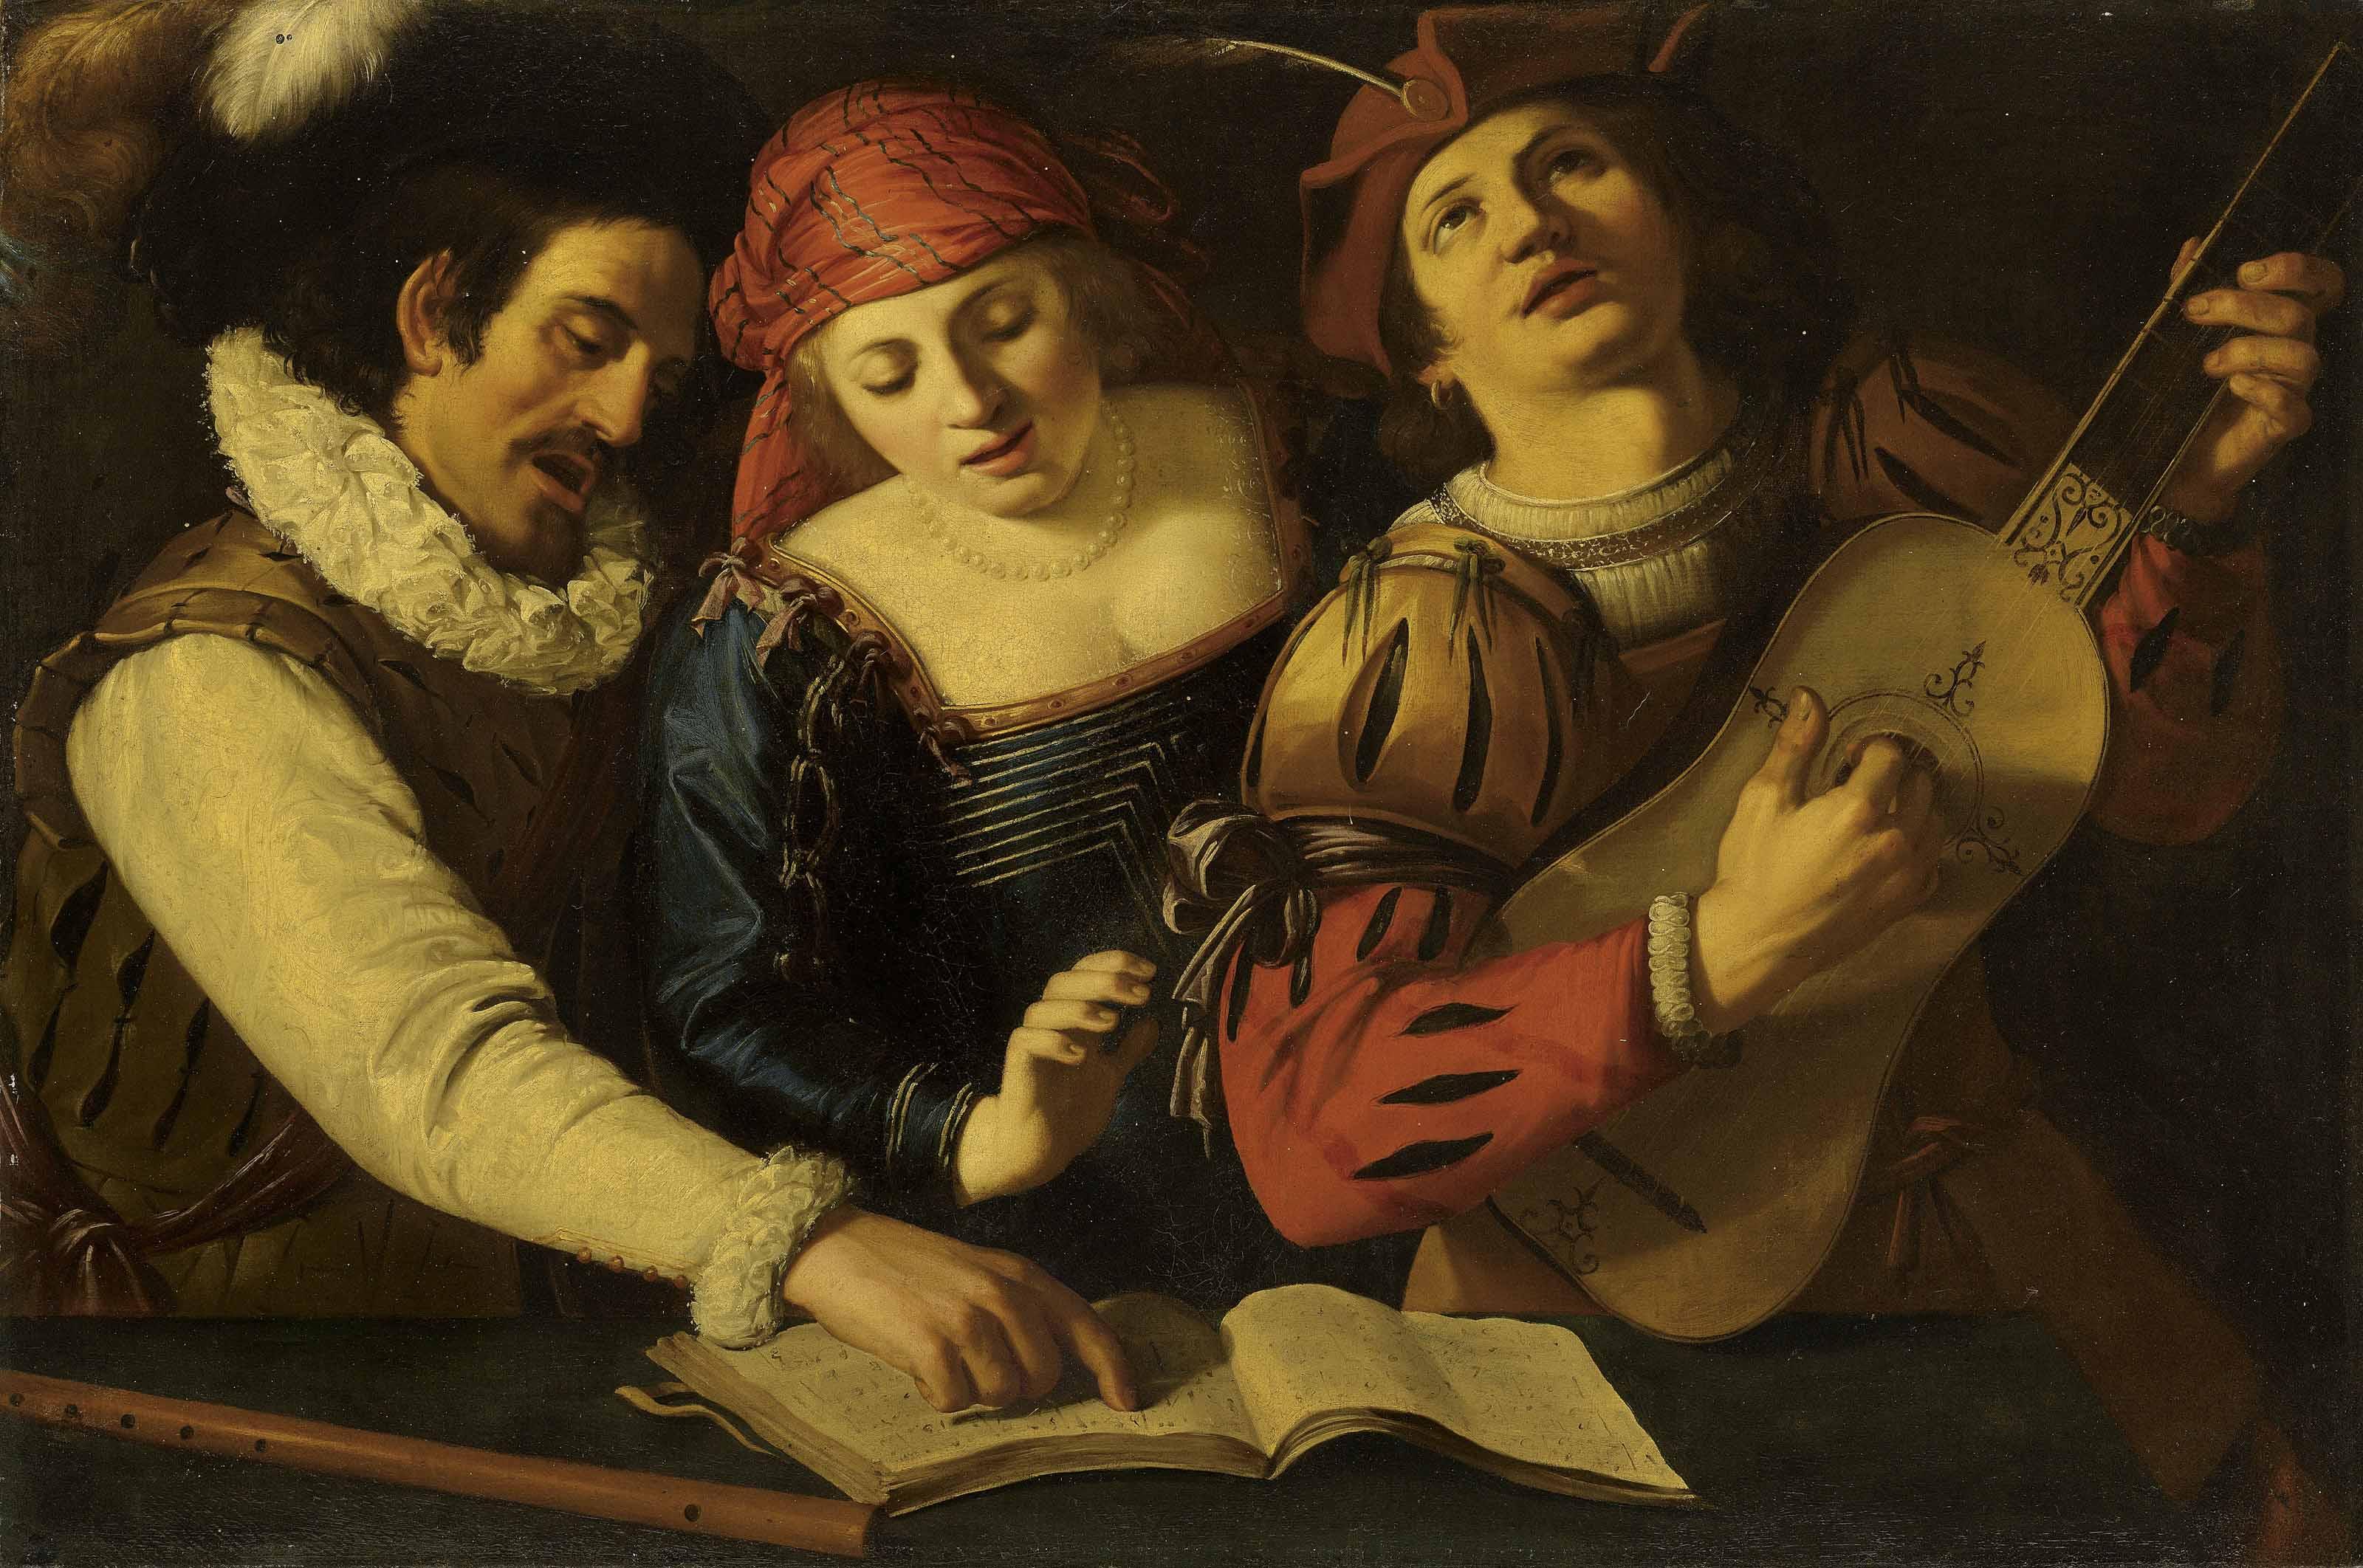 Northern follower of Michelangelo Merisi da Caravaggio, 17th century